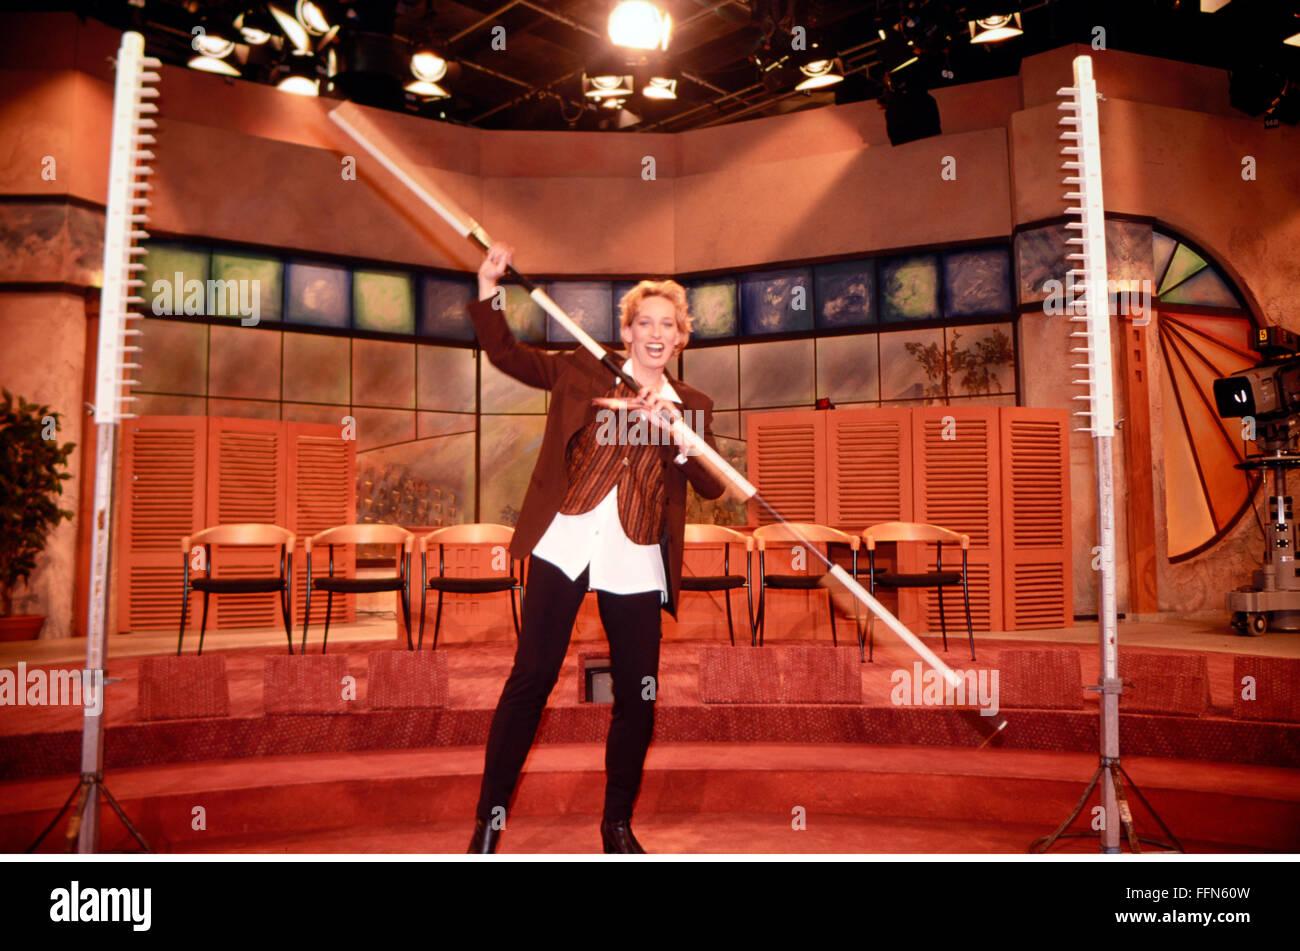 Schaefer, Baerbel, * 16.12.1963, German presenter, half length, during the recording of the 250th episode of her - Stock Image